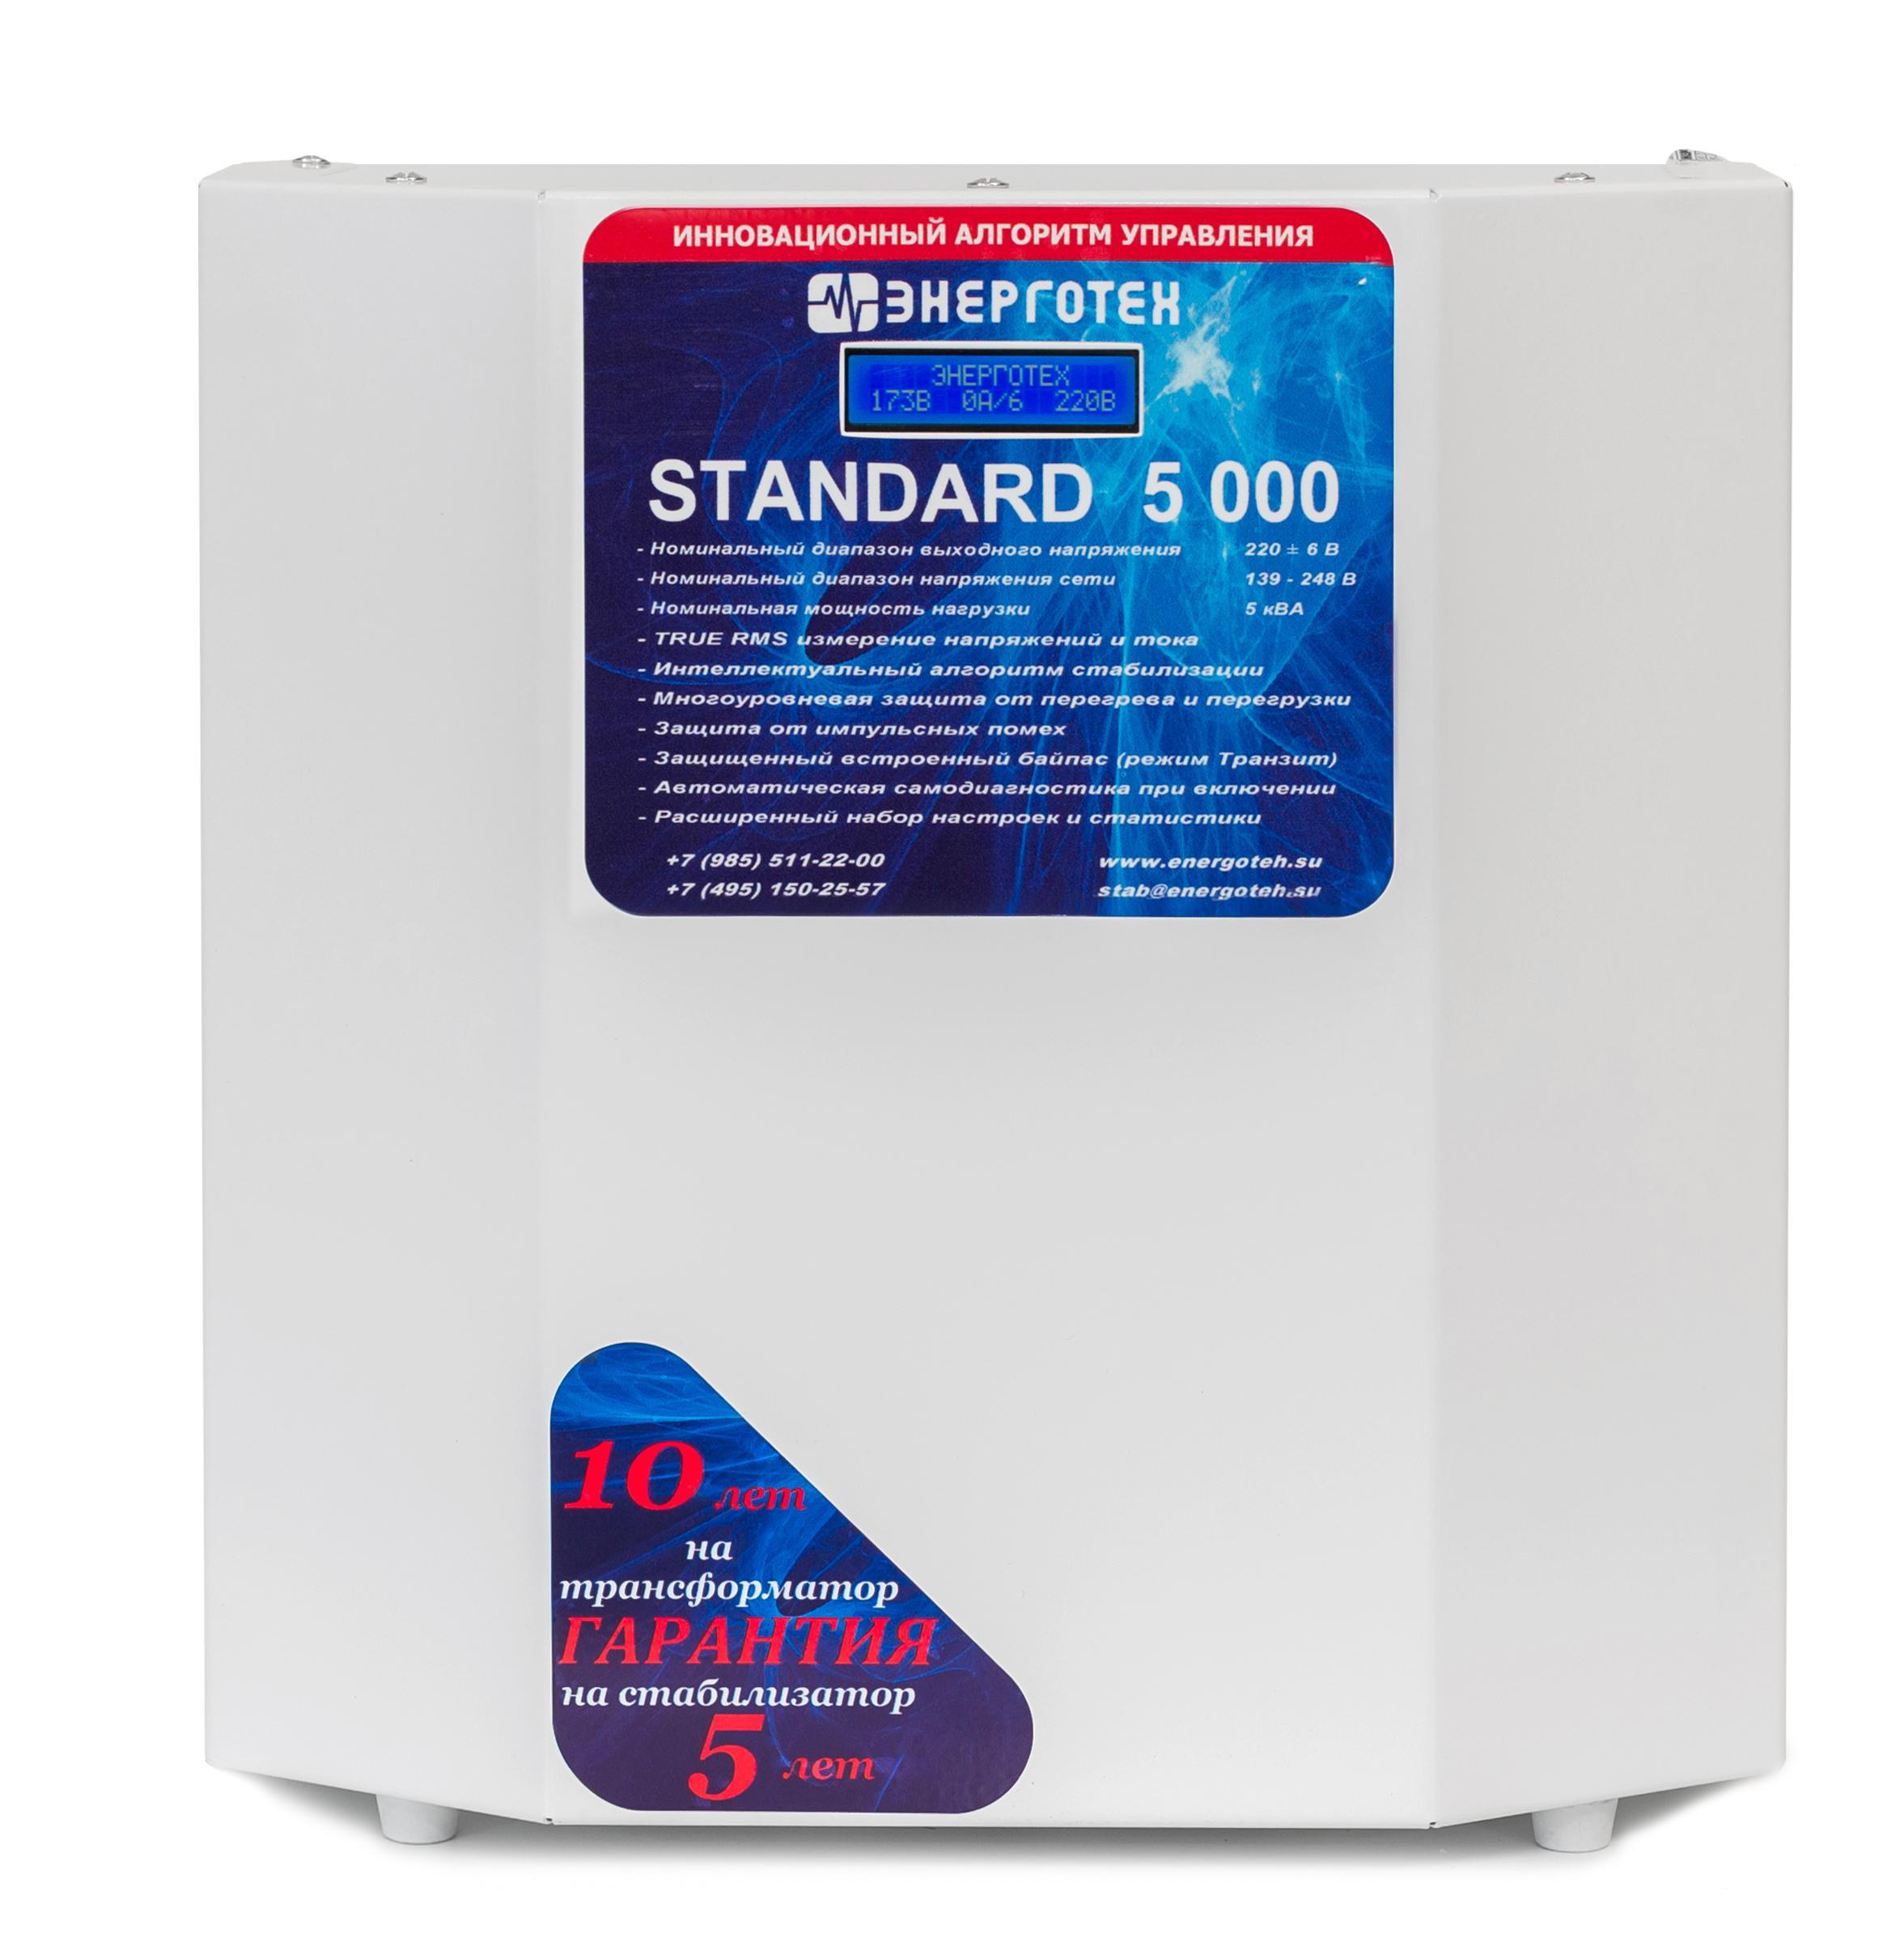 Стабилизатор напряжения ЭНЕРГОТЕХ Standard 5000 (hv) standard regular 2 tag gun fasteners 5000